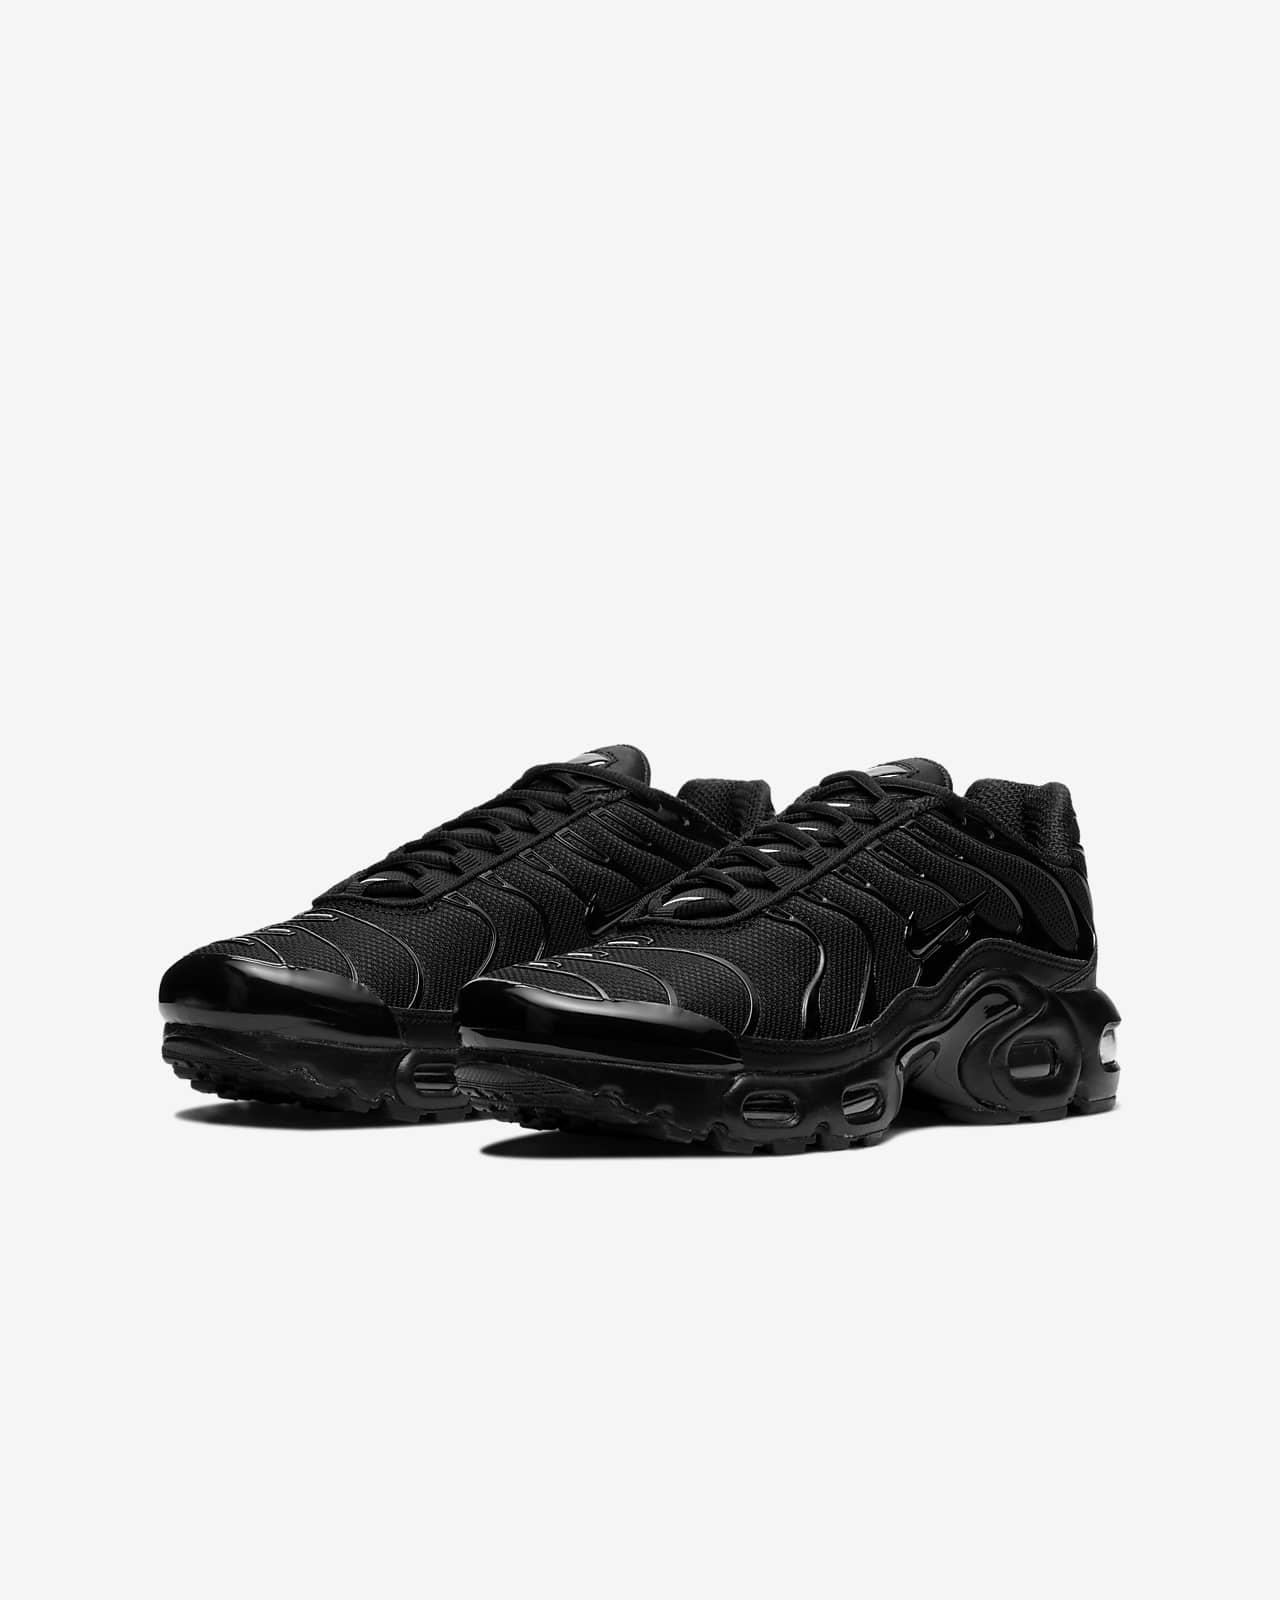 Nike Air Max Plus Older Kids' Shoe. Nike LU